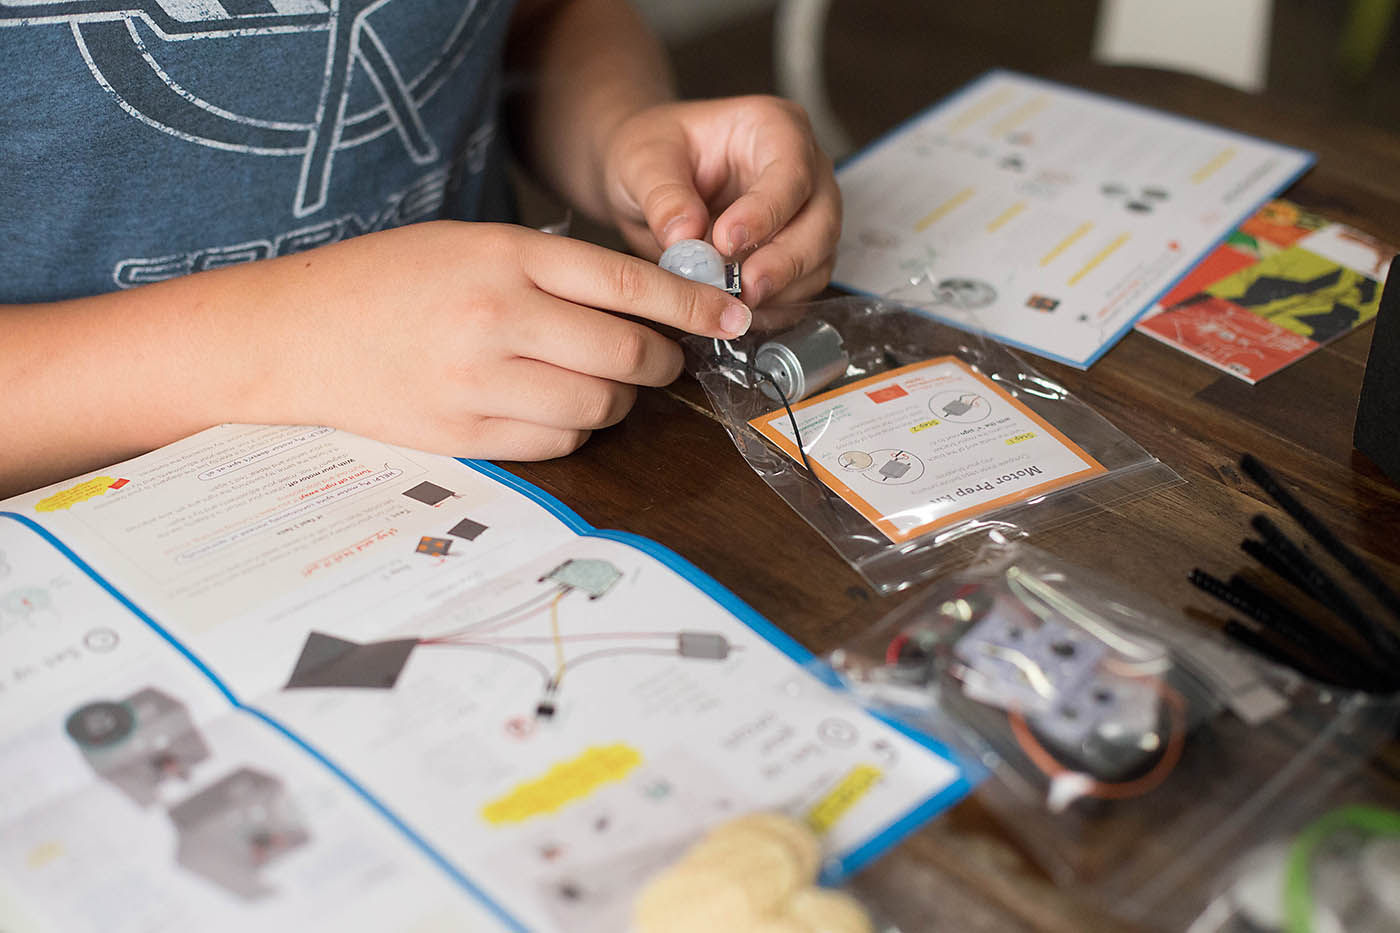 Tinker Crate and FamilyFun spider prank kit!